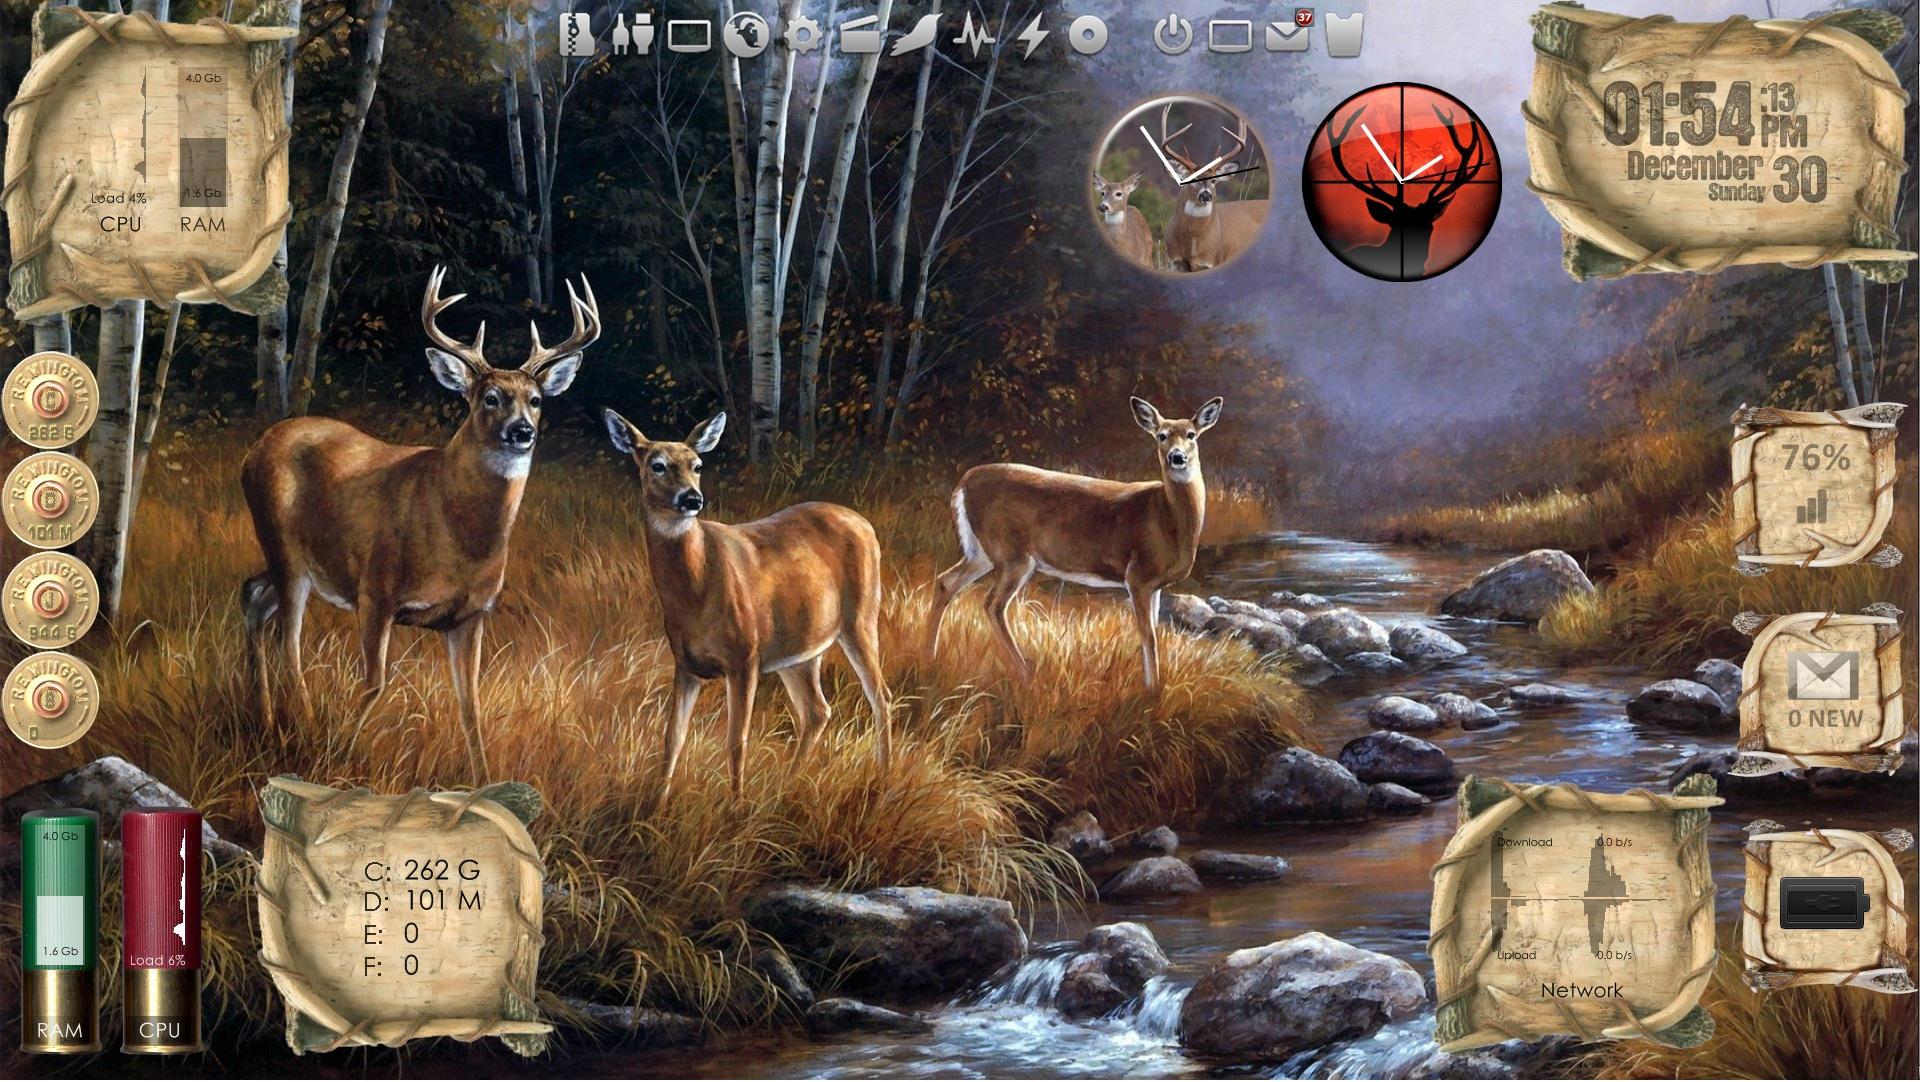 Outdoor Living - Deer - Desktop for Rainmeter v1.1 by ionstorm01